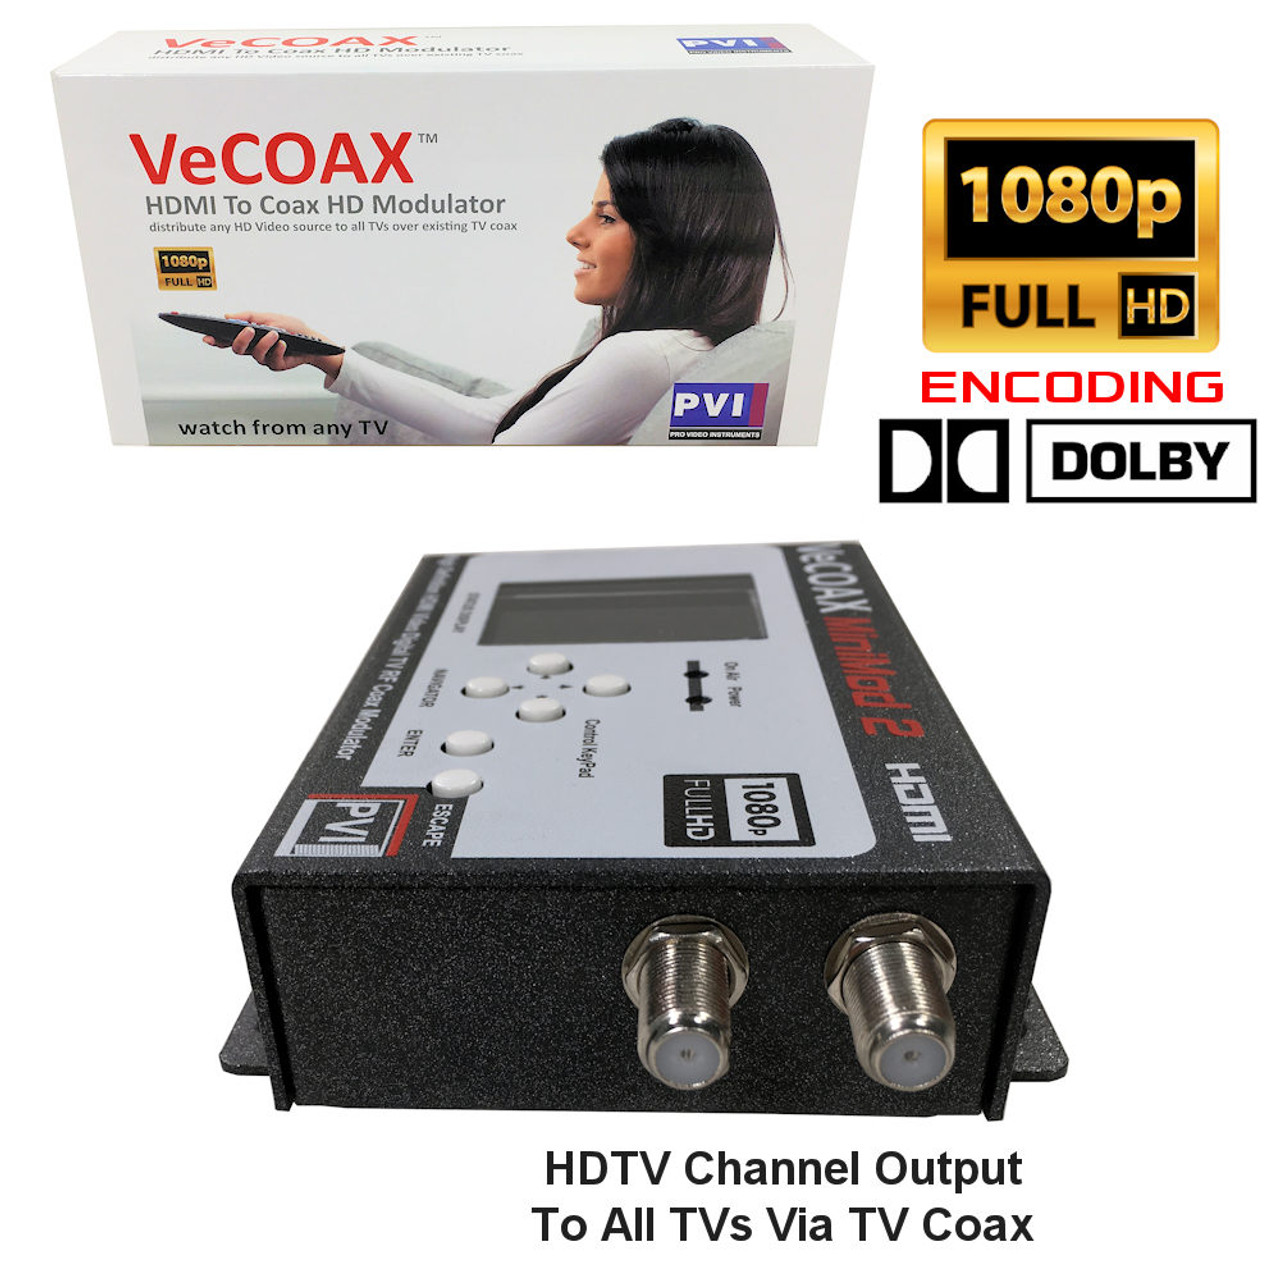 VeCOAX Minimod 2 1080p Full HD Dolby Ultra Compact Digital TV Modulator